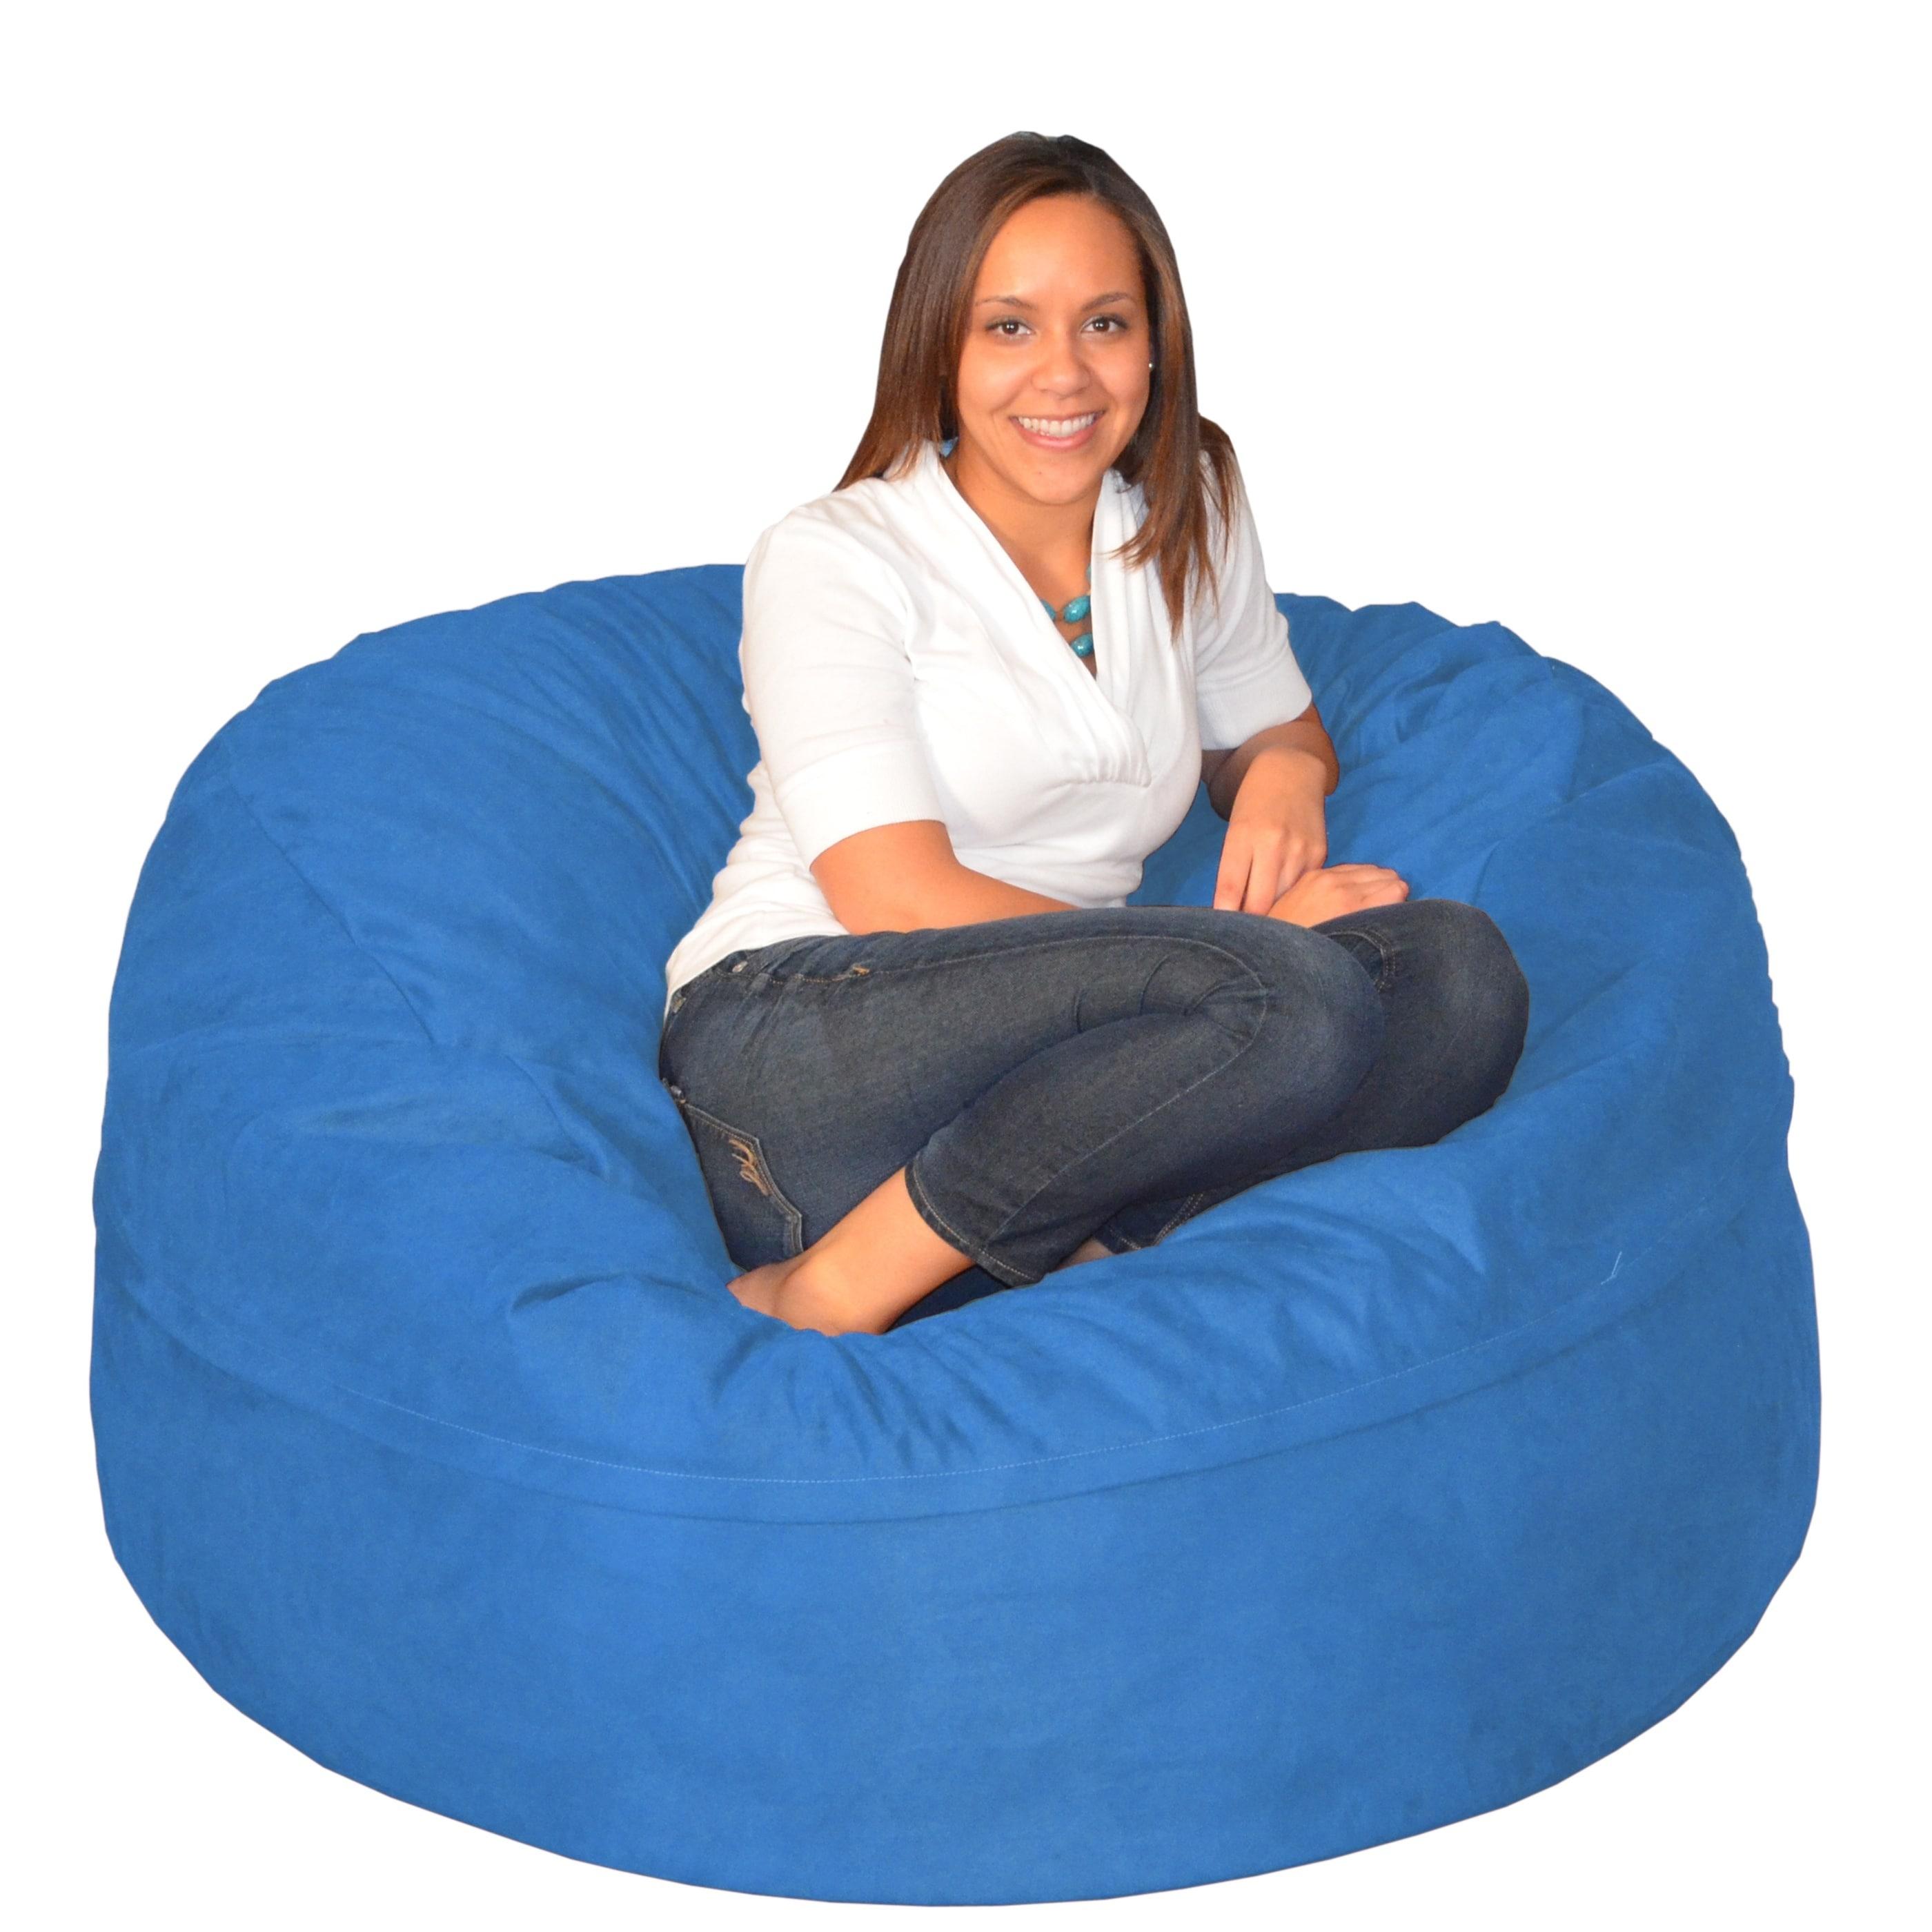 Enjoyable Porch Den Green Bridge Large Memory Foam Bean Bag 5 Foot Foam Chair Short Links Chair Design For Home Short Linksinfo